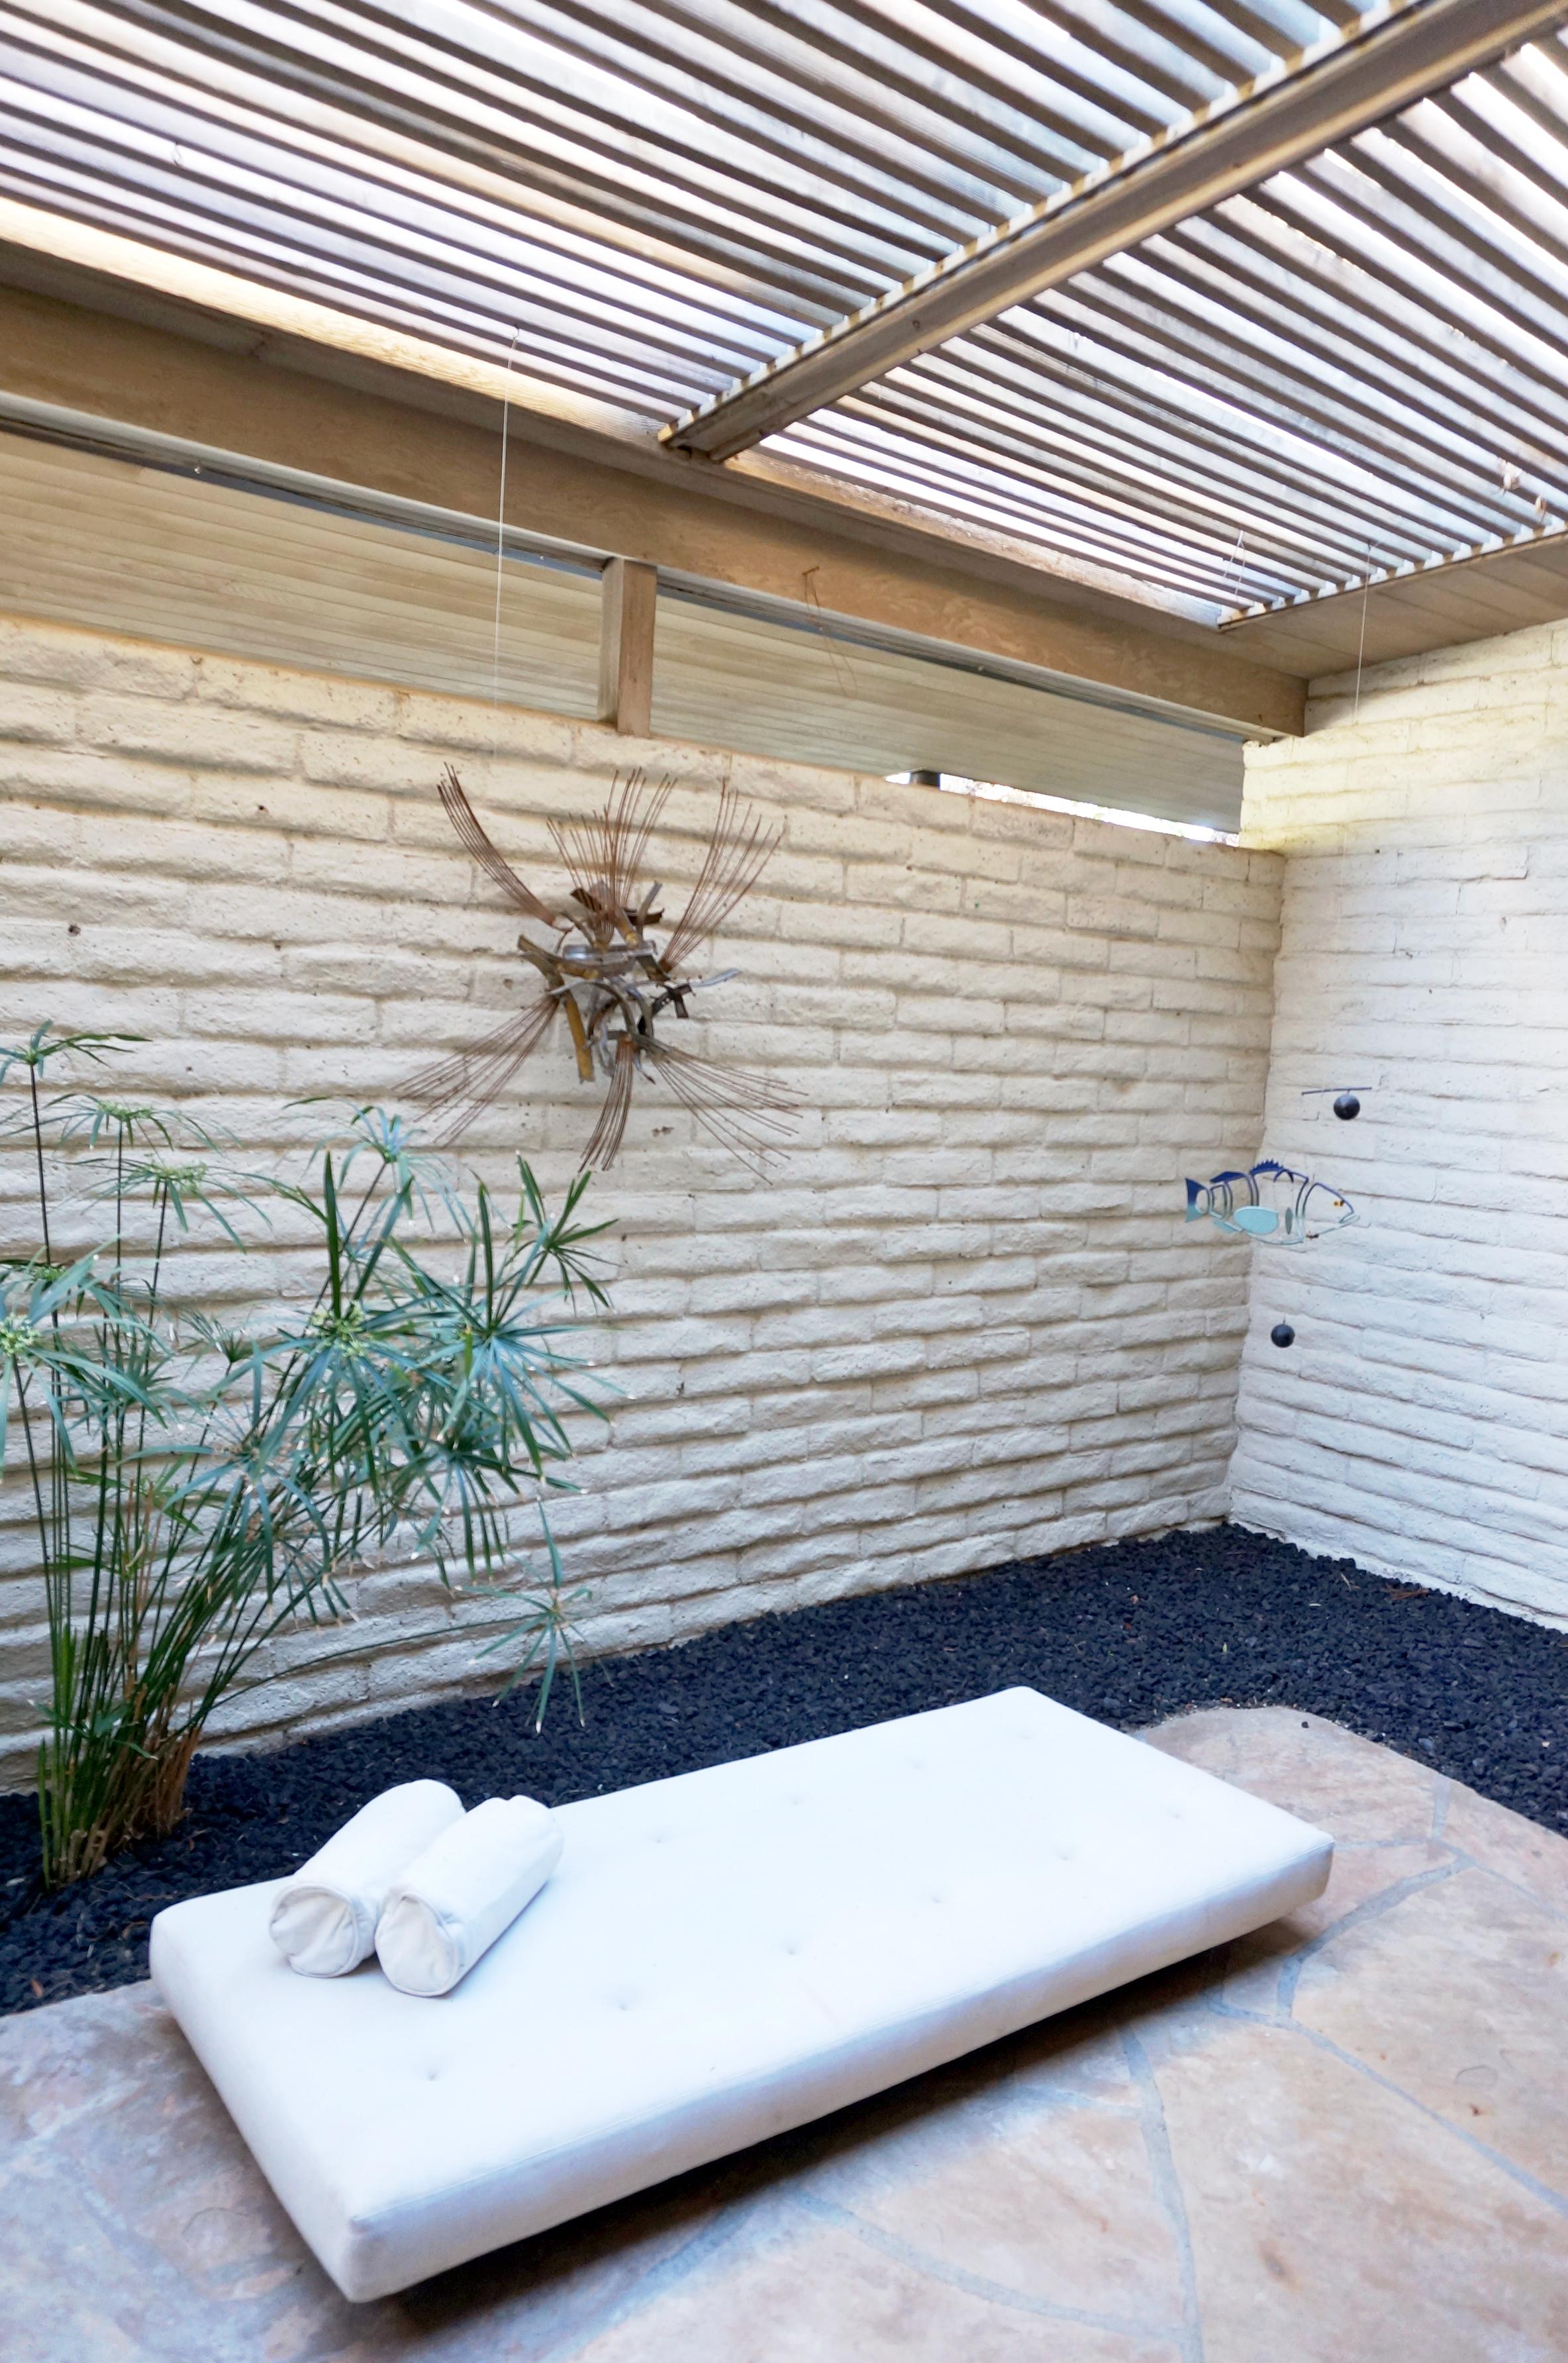 a peaceful atrium with a distinct Japanese influence